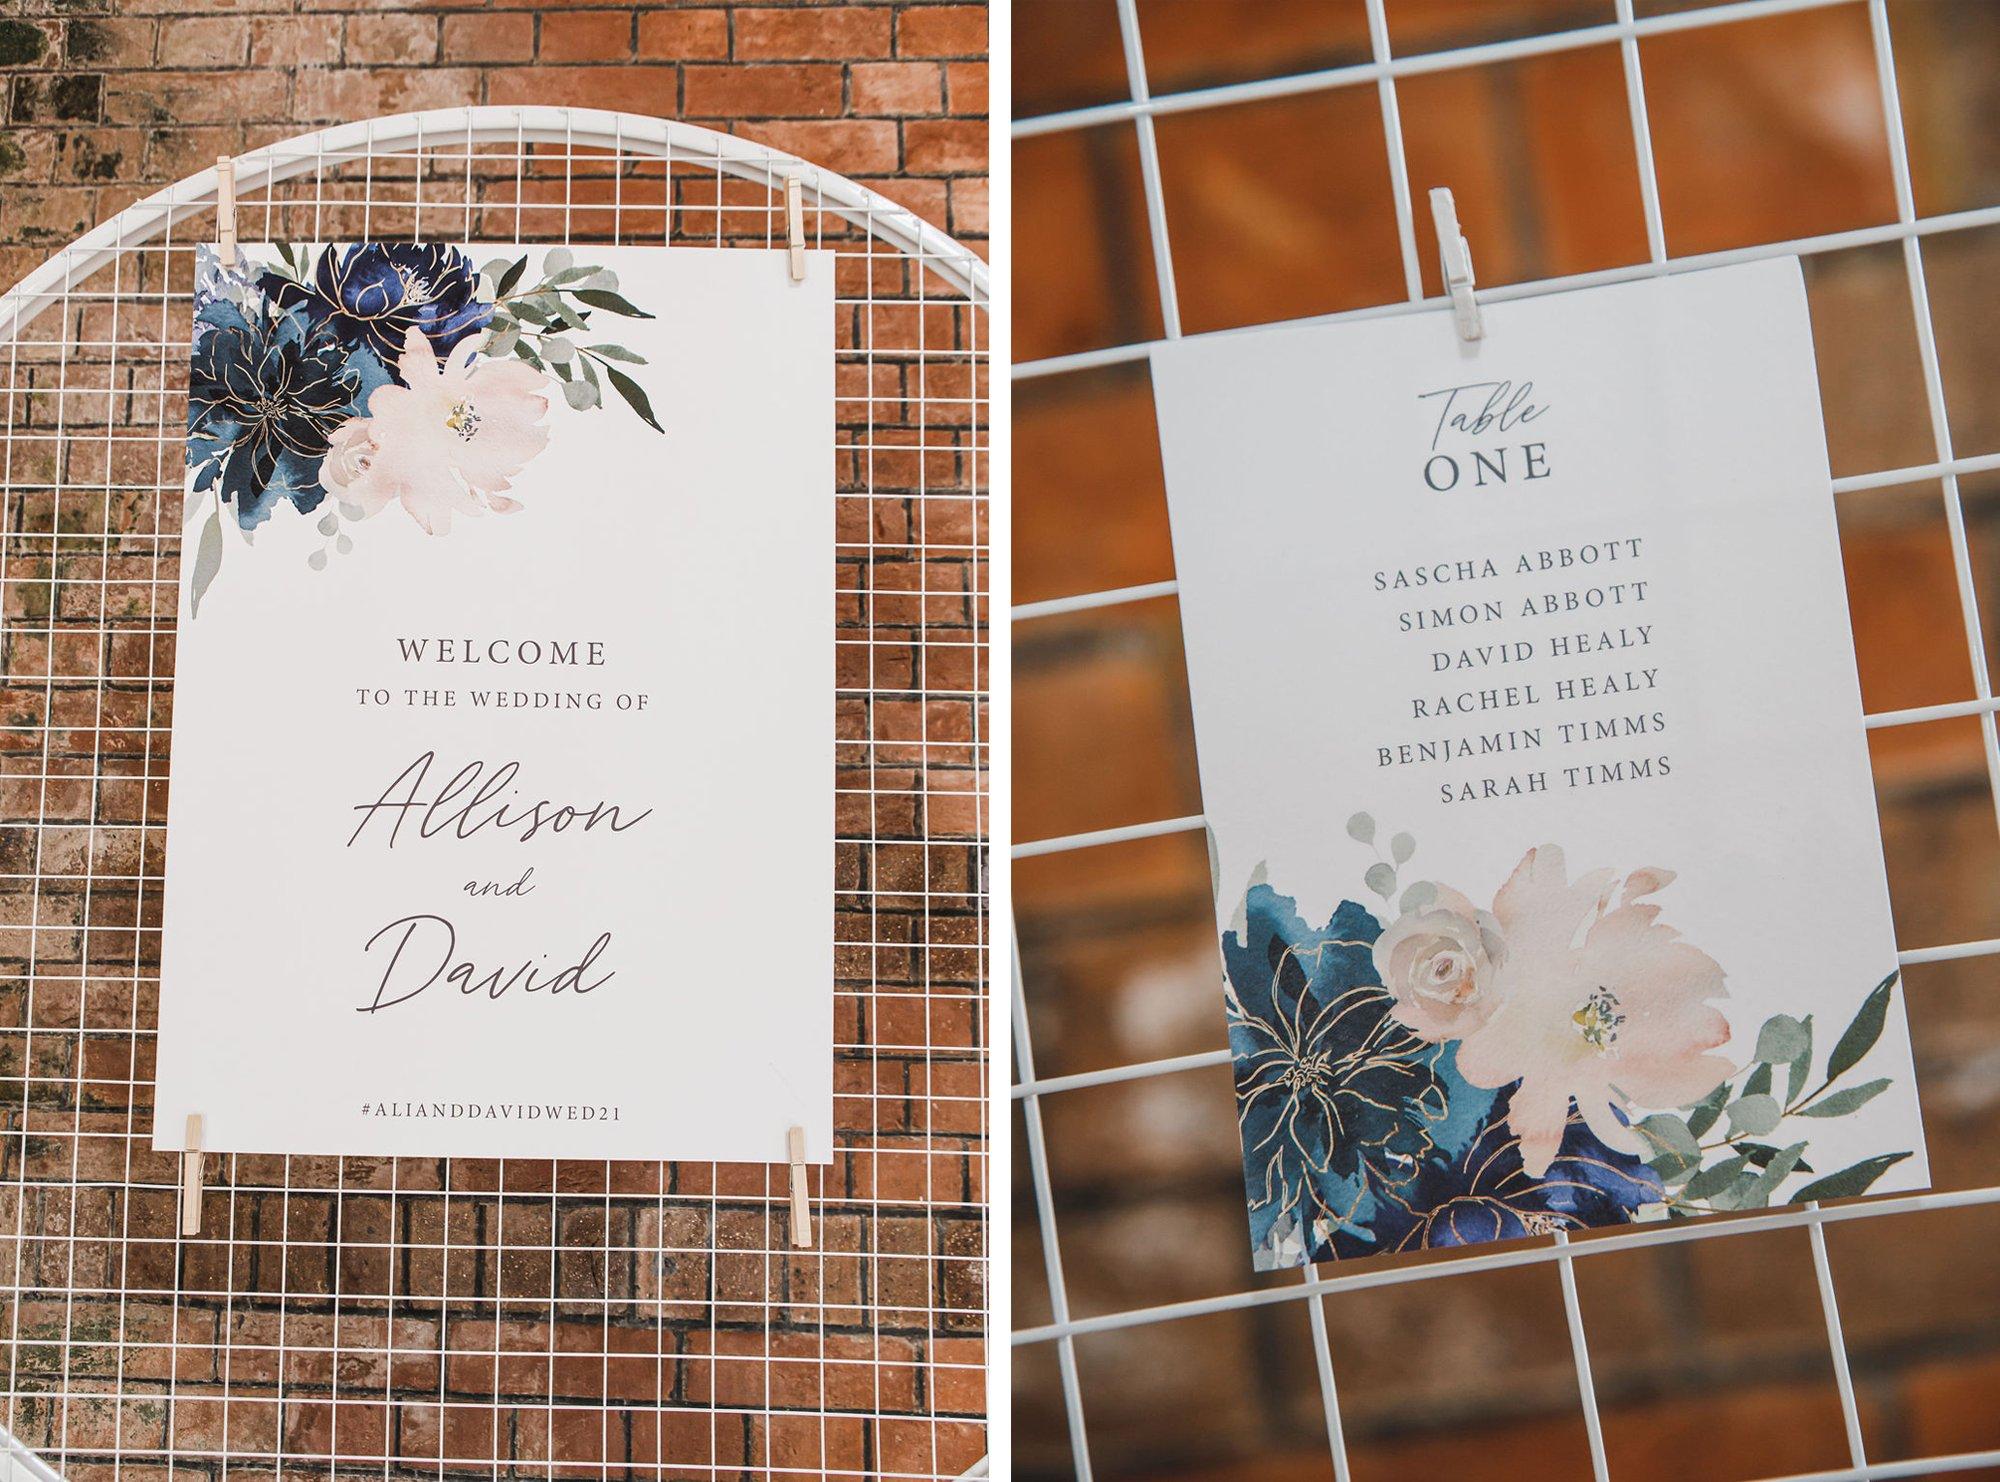 Blue and Blush Floral Wedding Signage Ideas, Flamboyant Invites